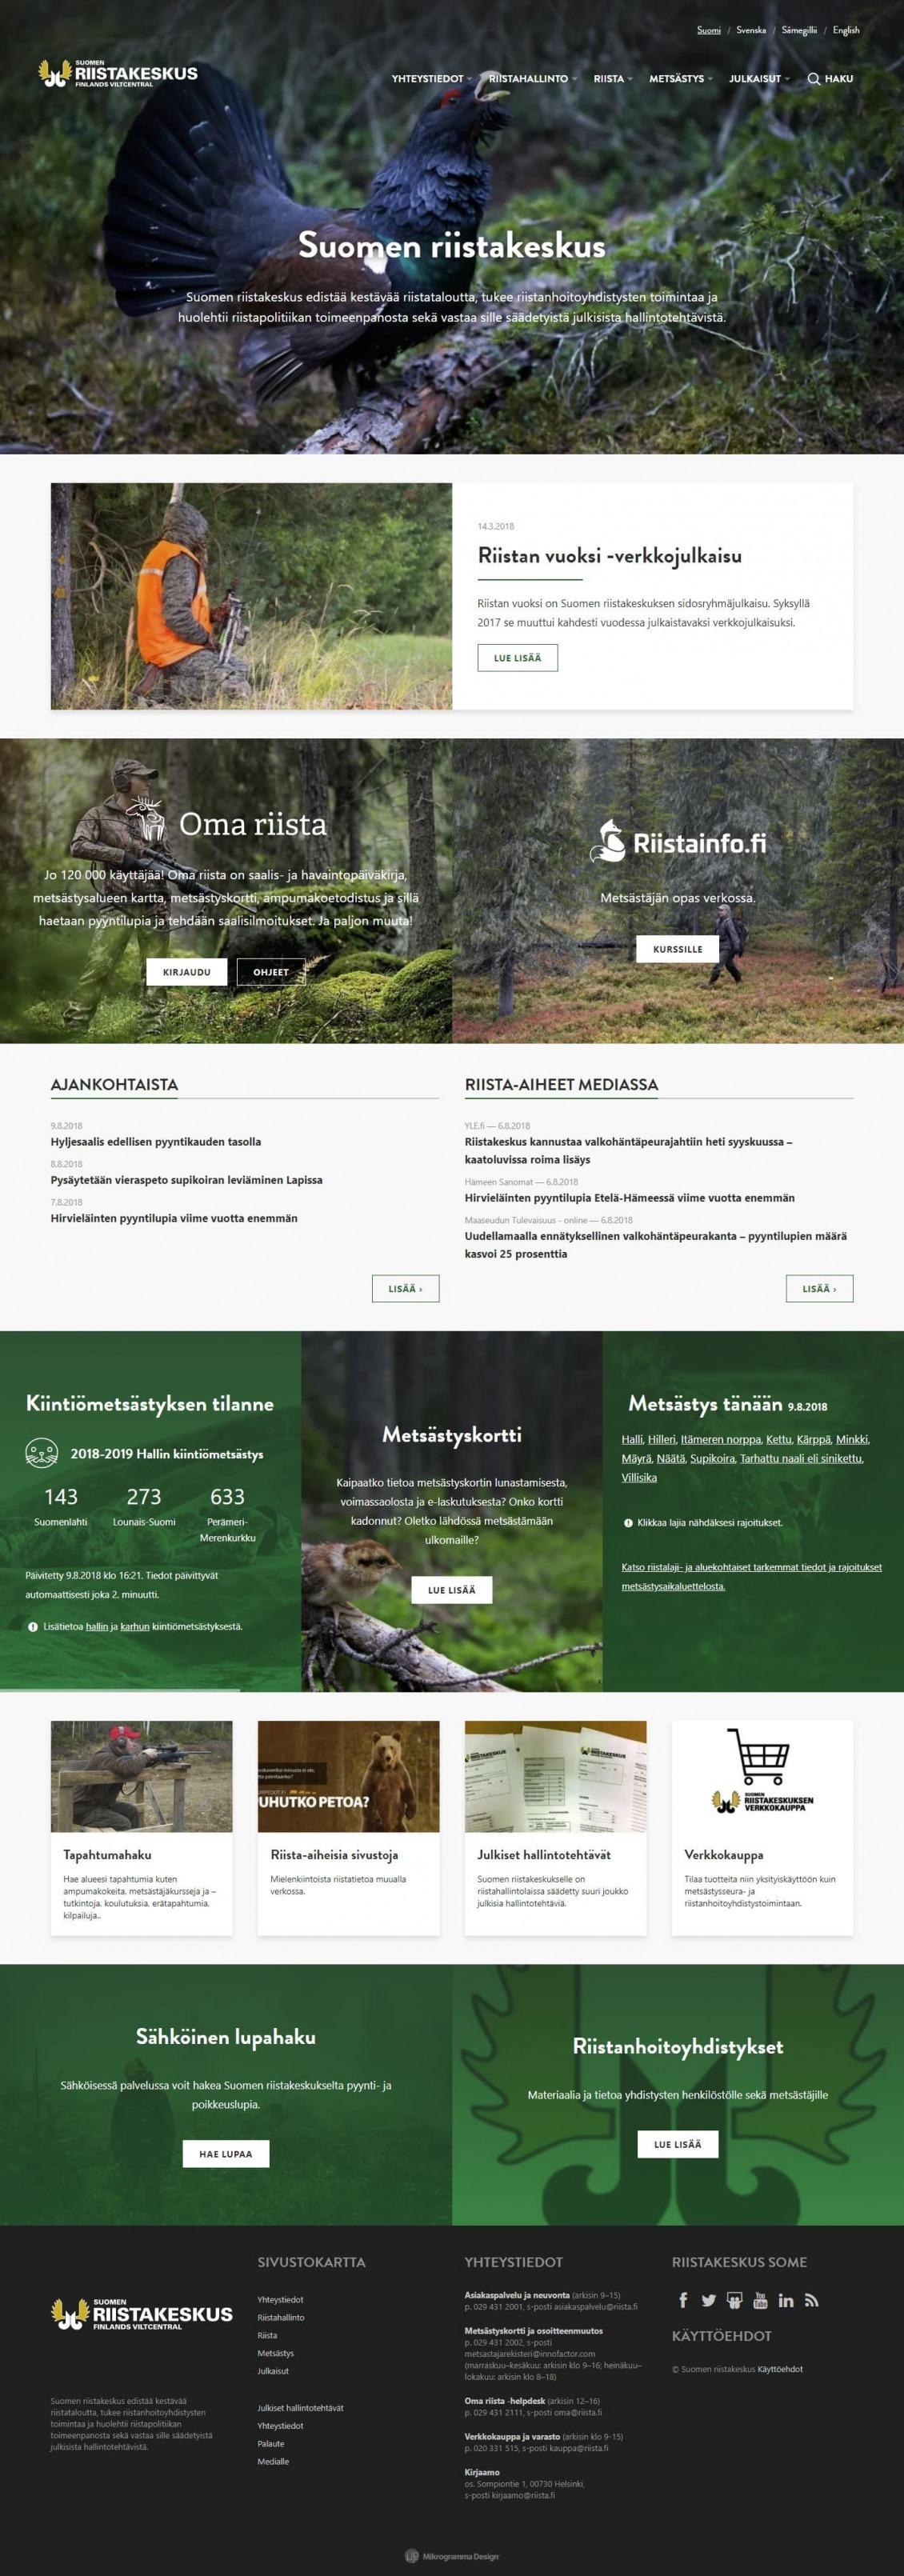 Suomen riistakeskus